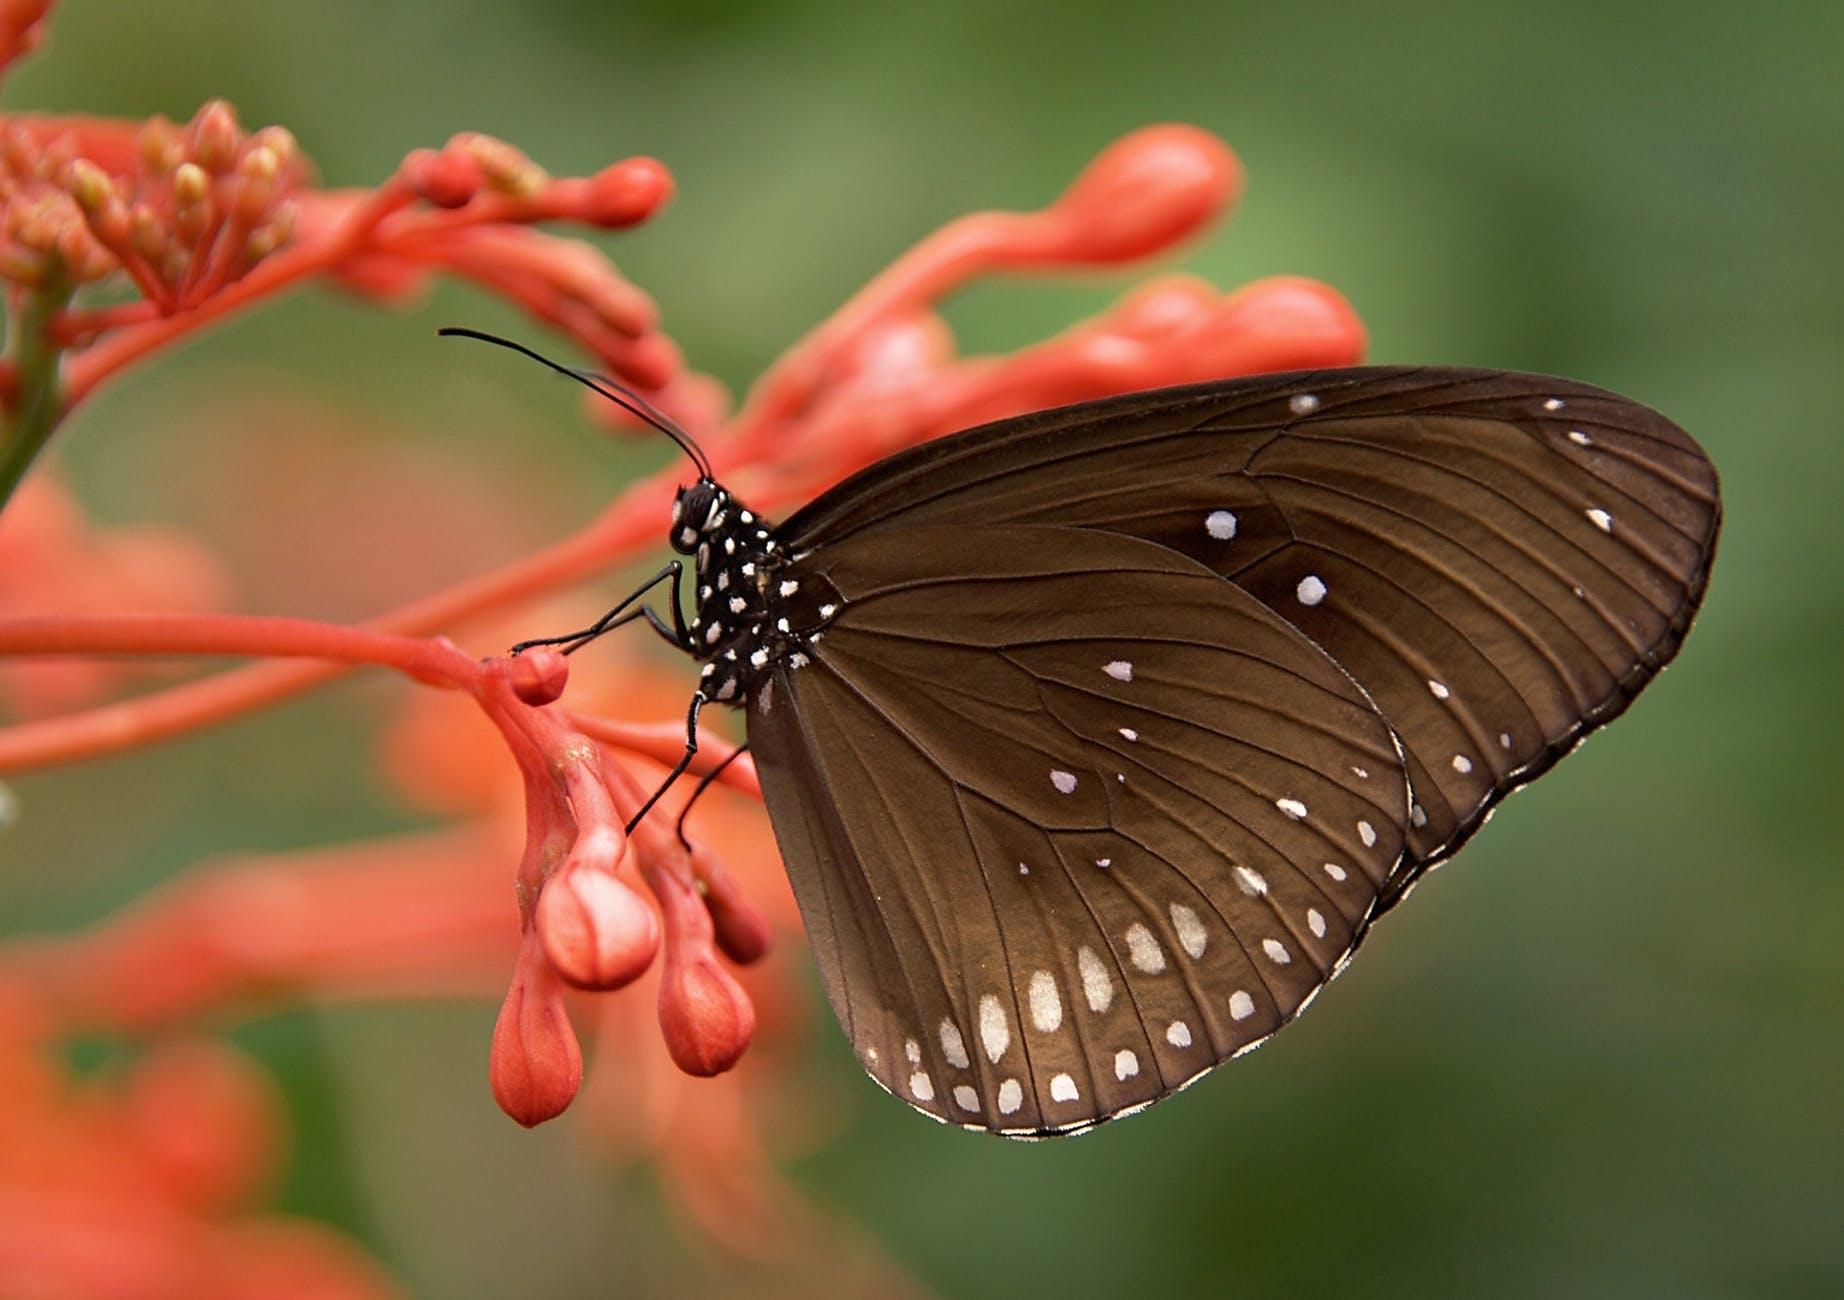 striped-core-butterflies-butterfly-brown-53957.jpeg